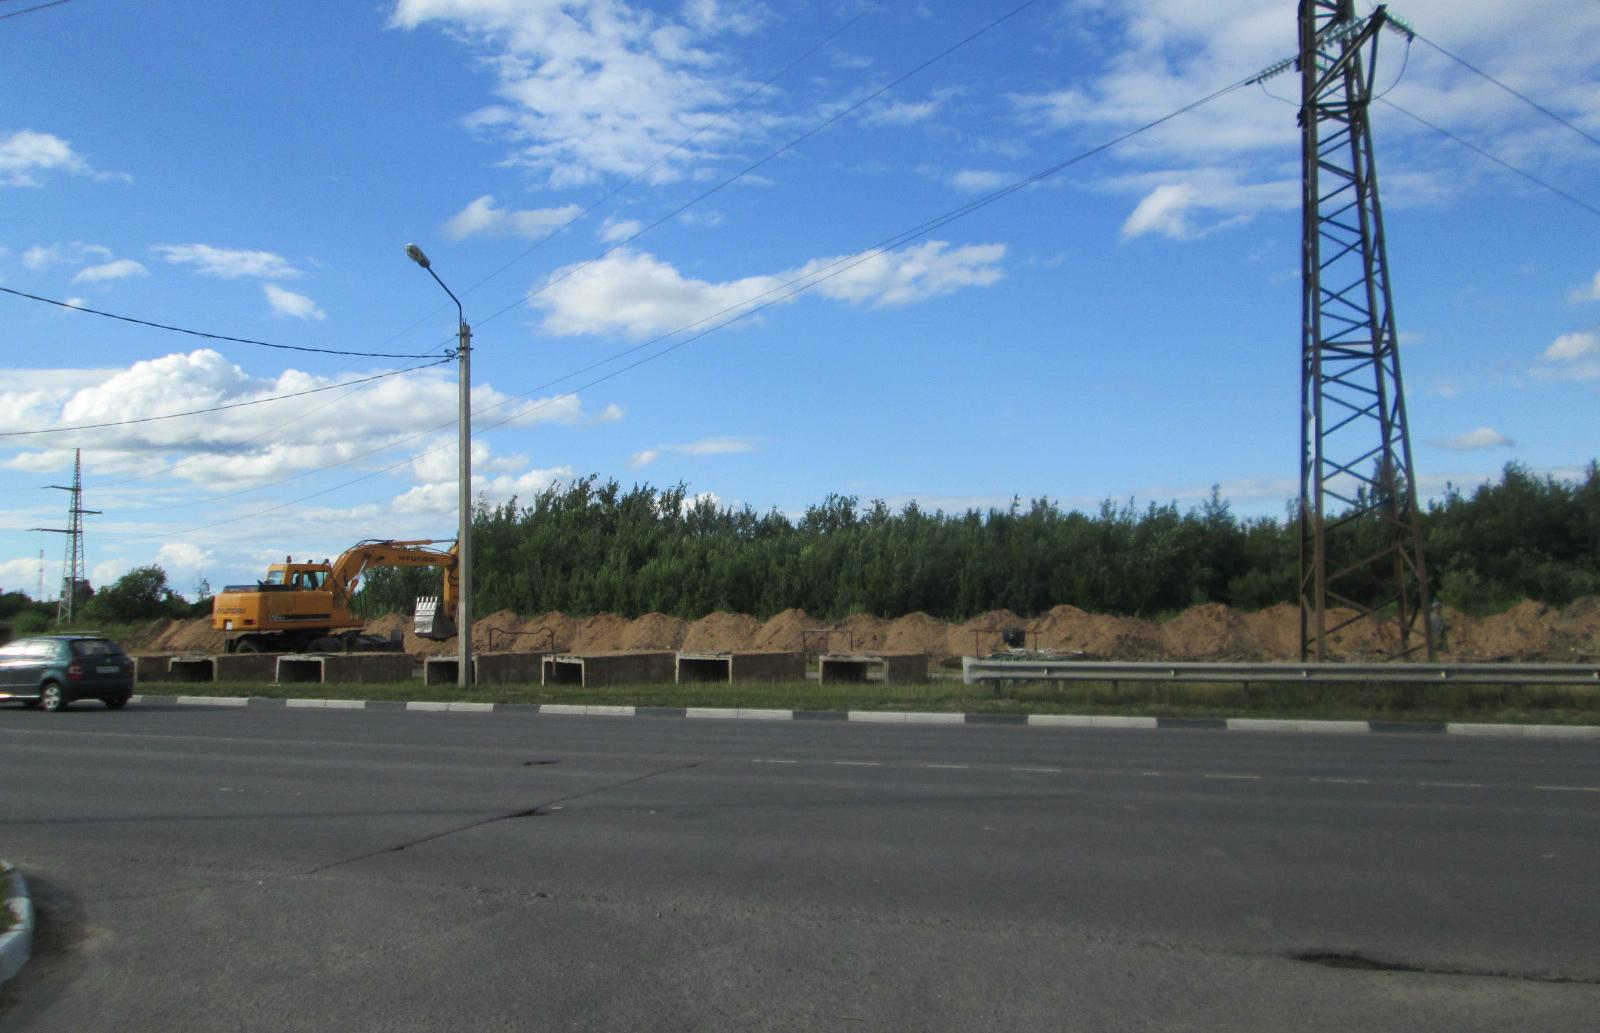 В Твери 5 гектаров на 2-й Красина застроят многоэтажками - новости Афанасий